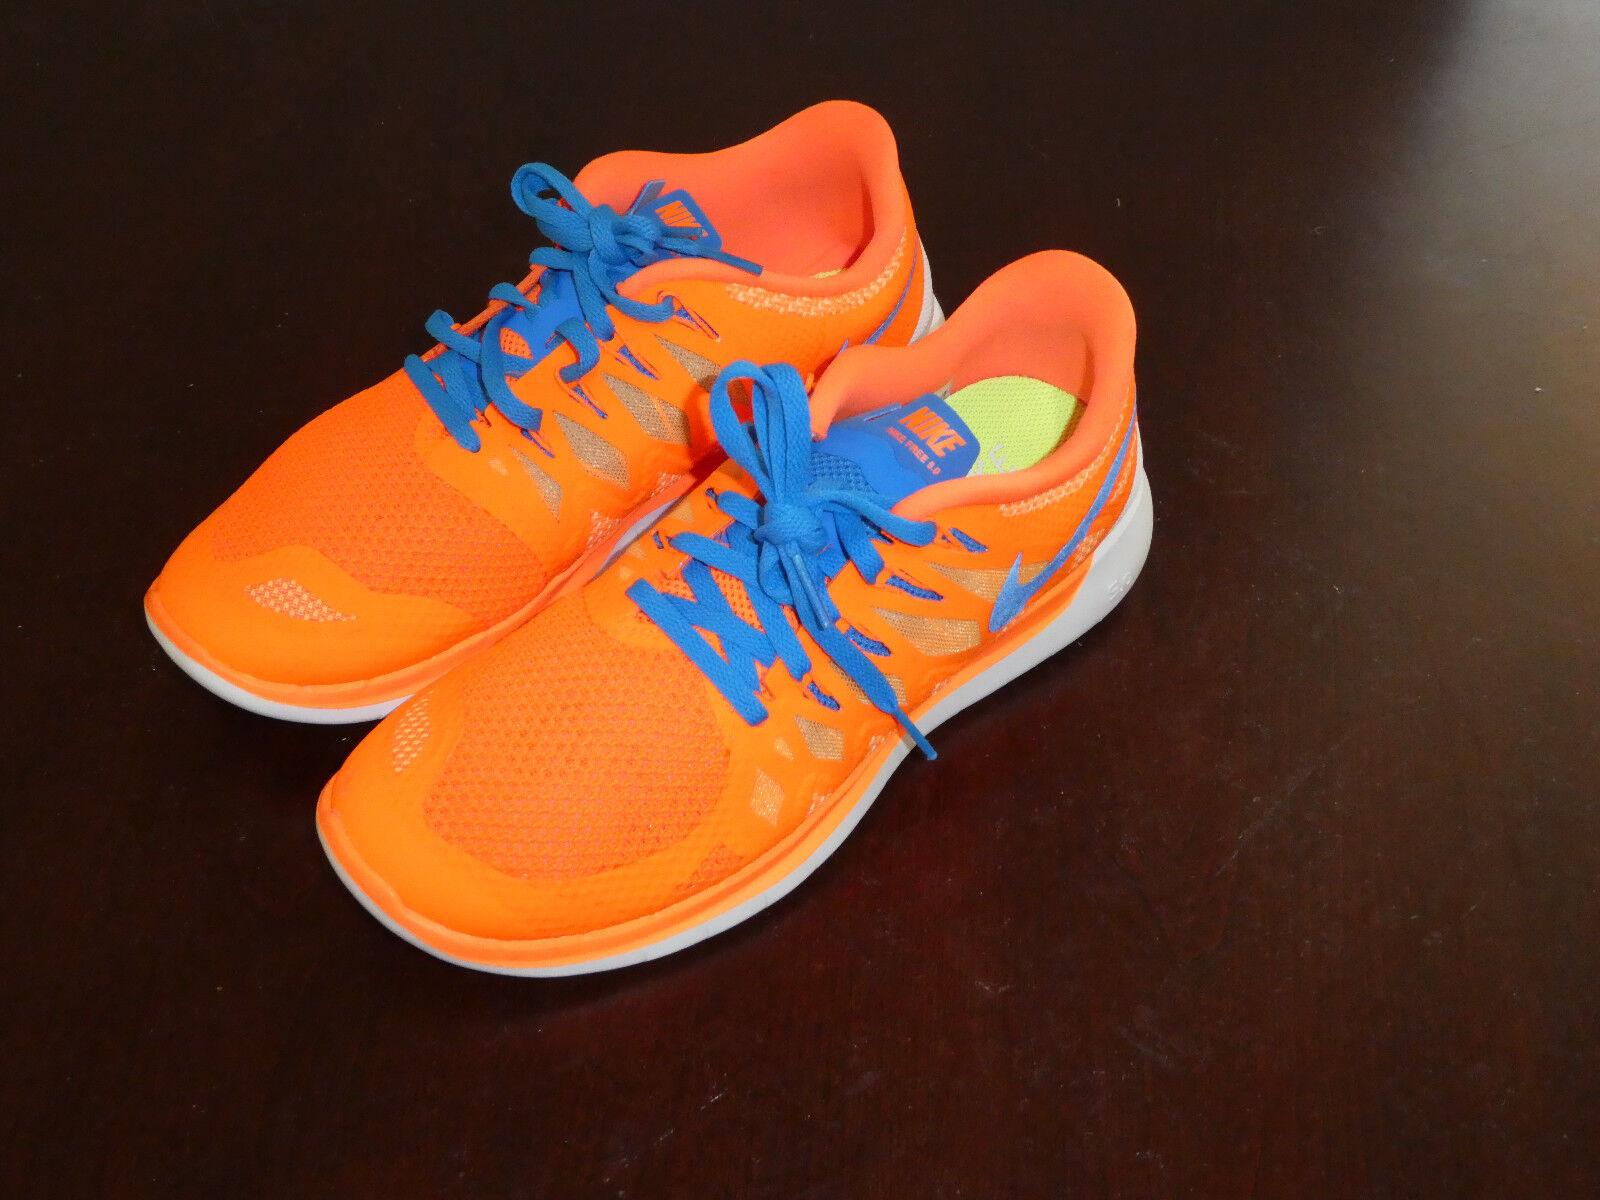 Nike Free 5.0 shoes sneakers orange new 642198 801